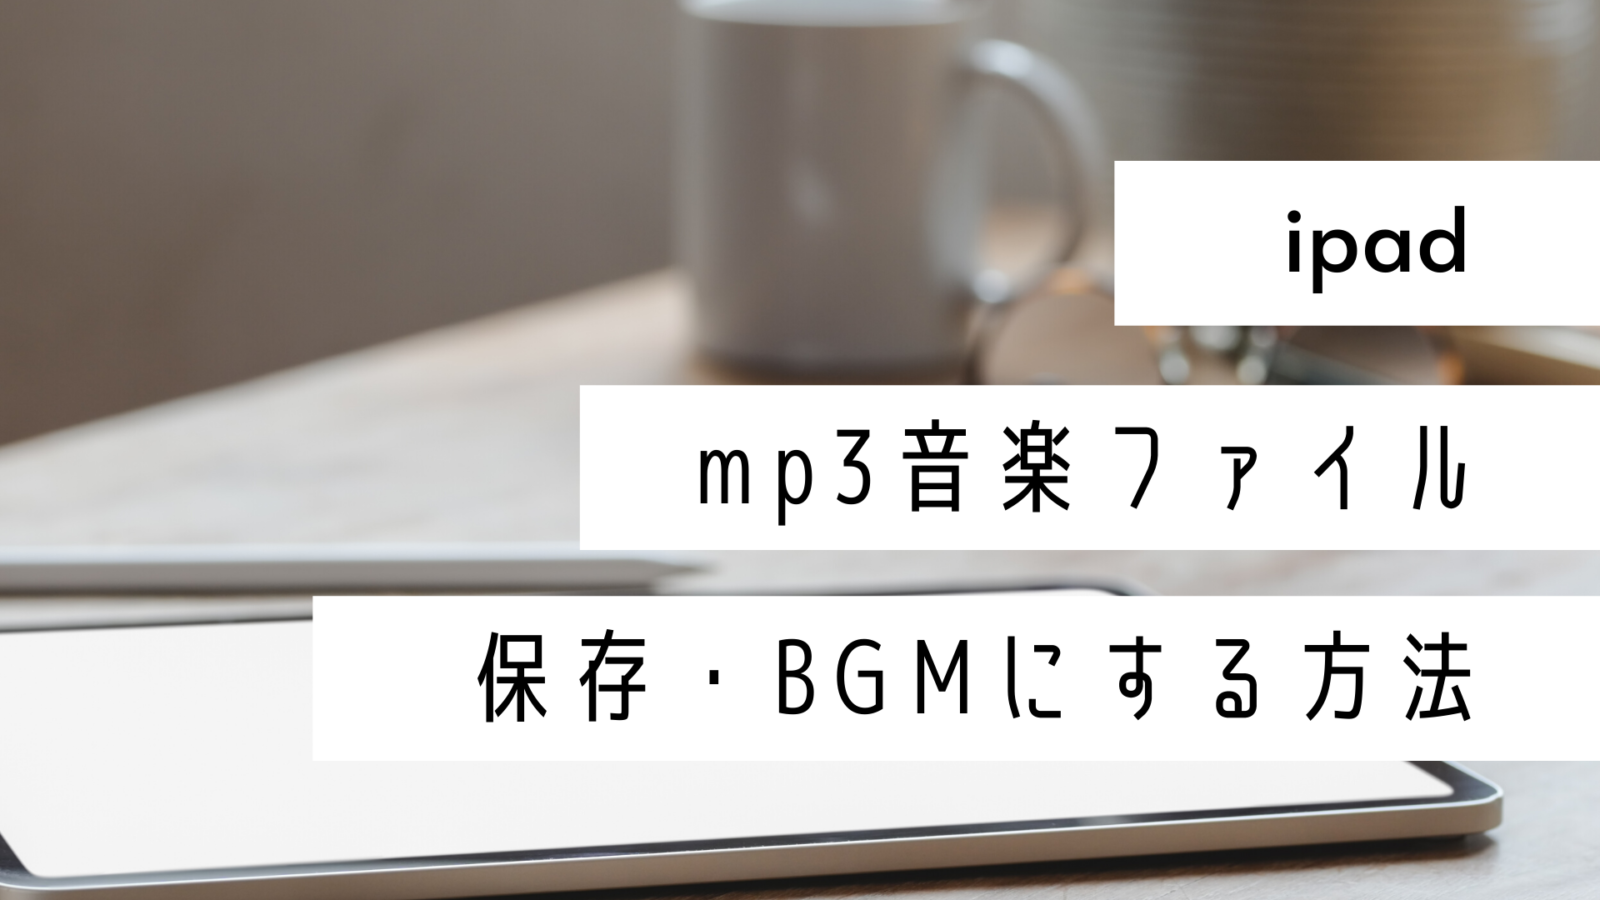 iPadでmp3の音楽ファイルを保存して動画にBGMをつける方法